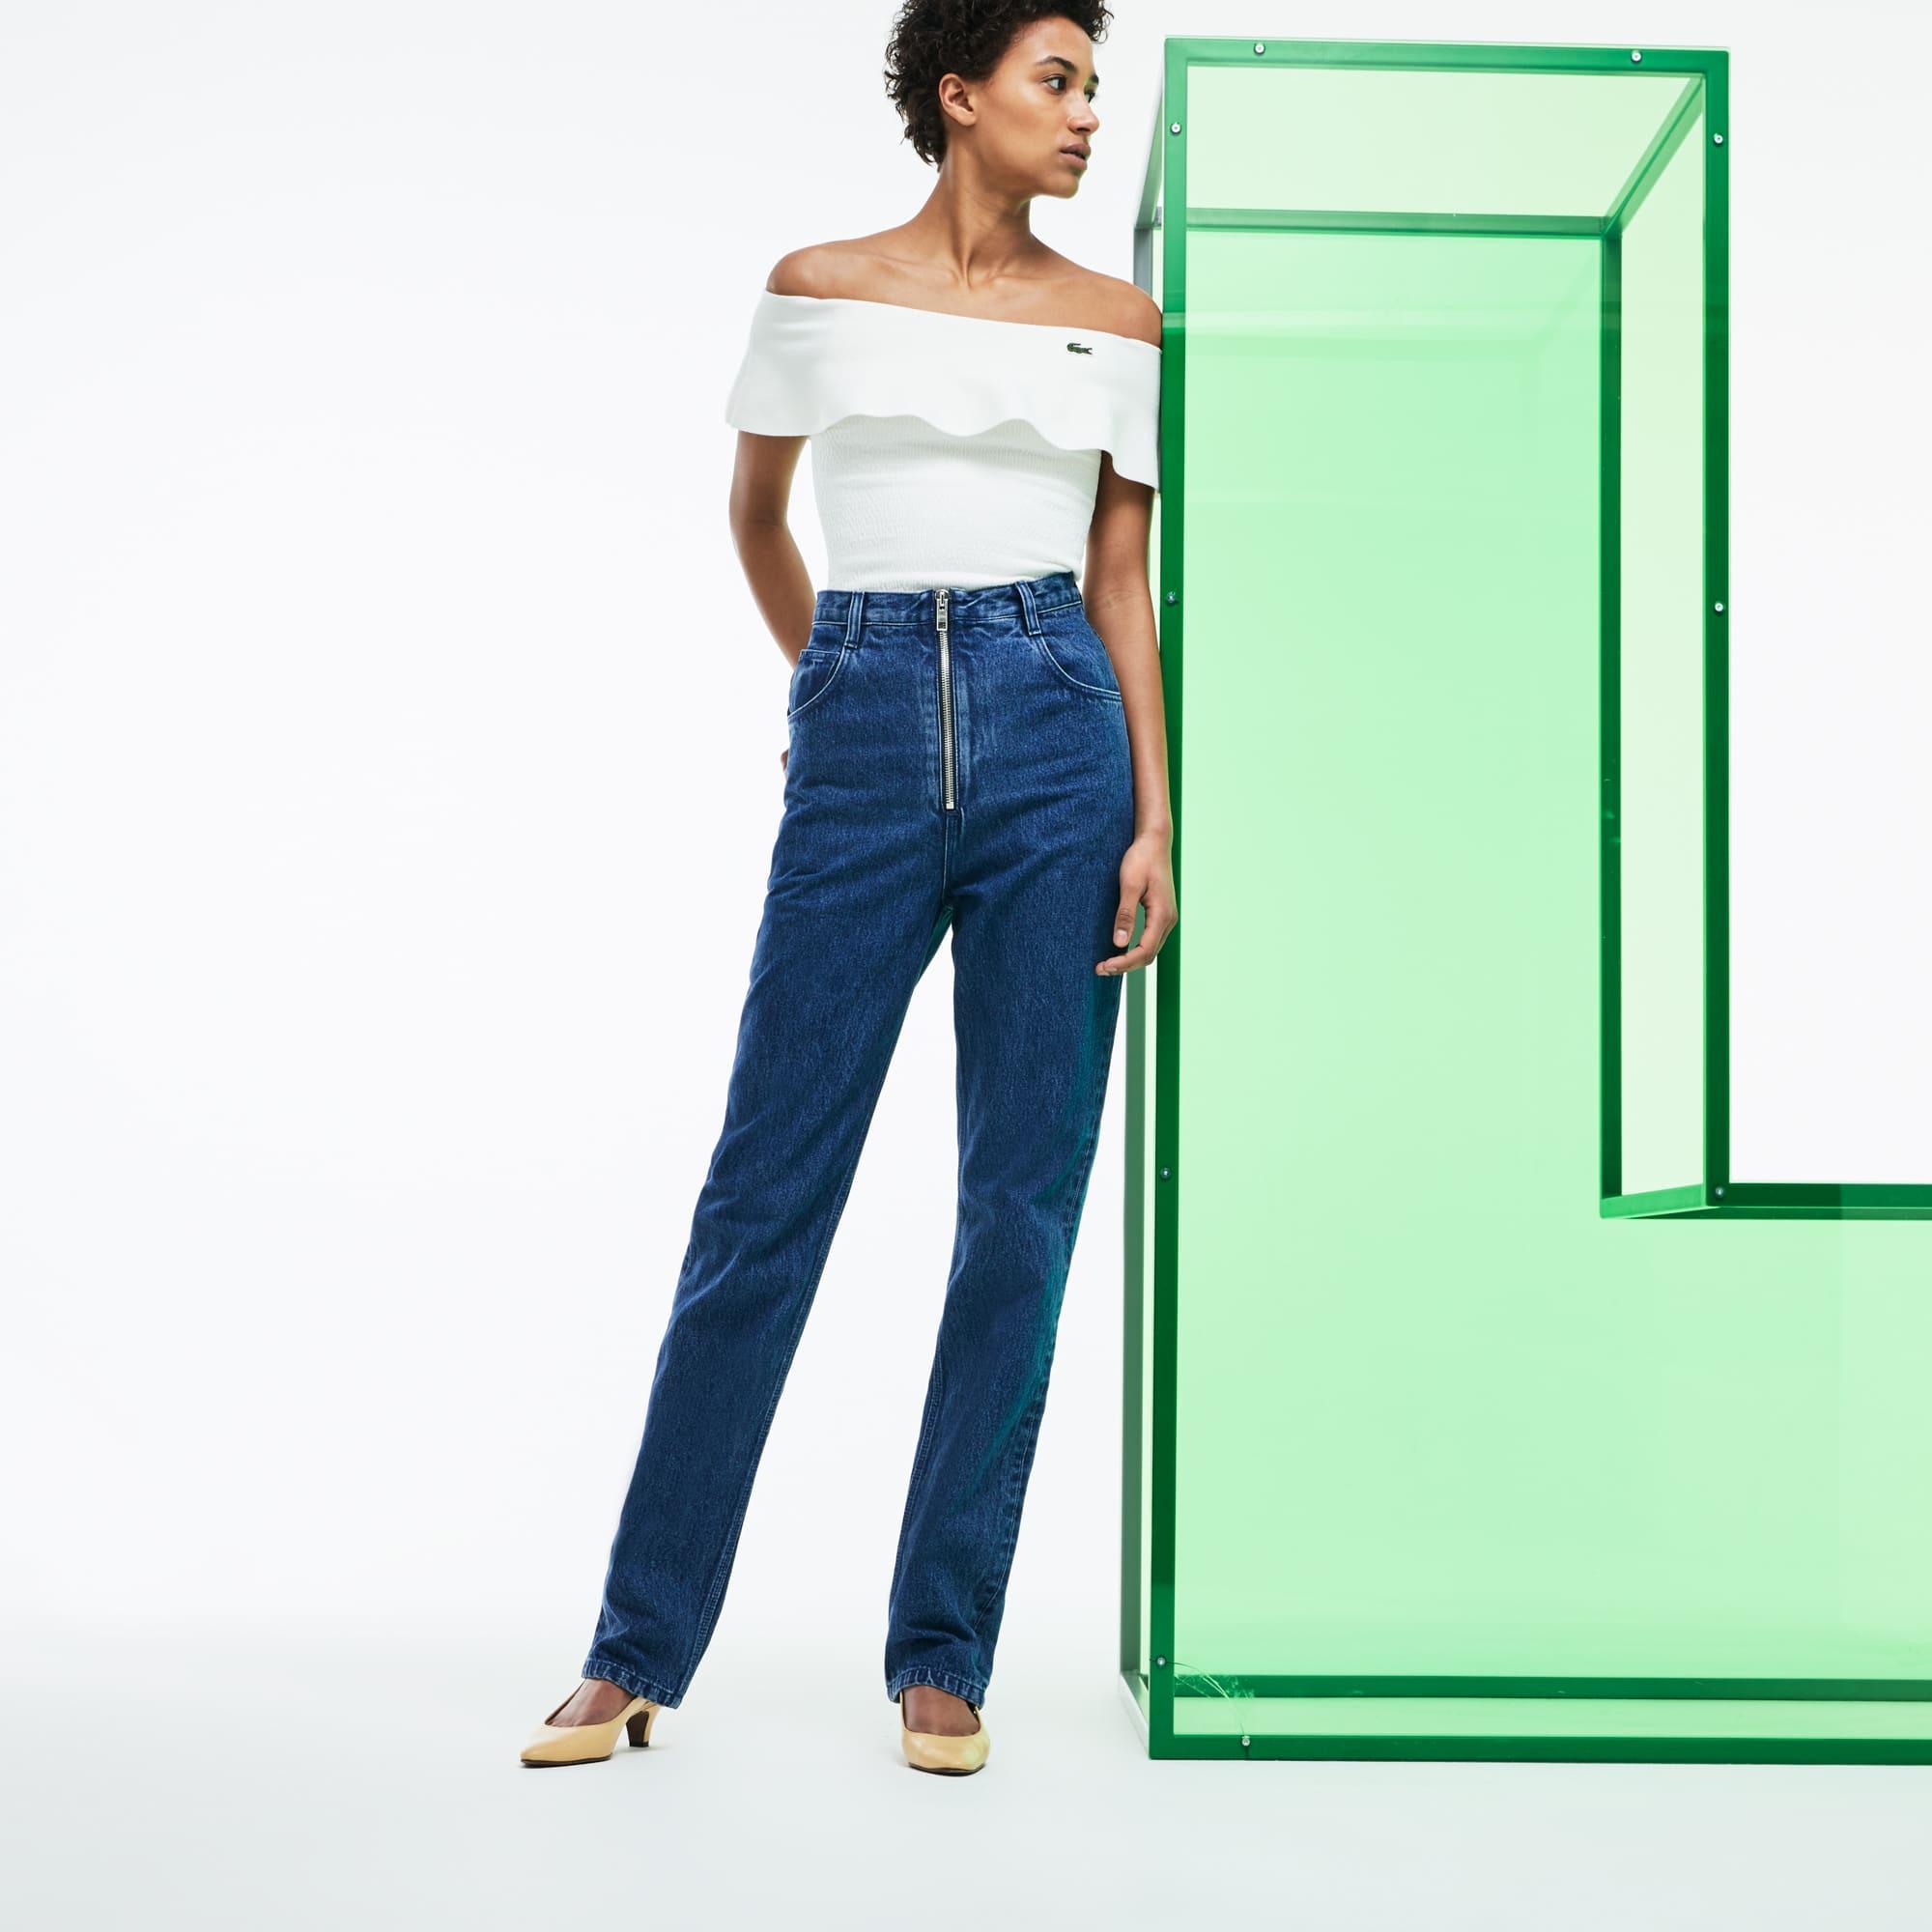 Jeans Édition Défilé met verhoogde taille